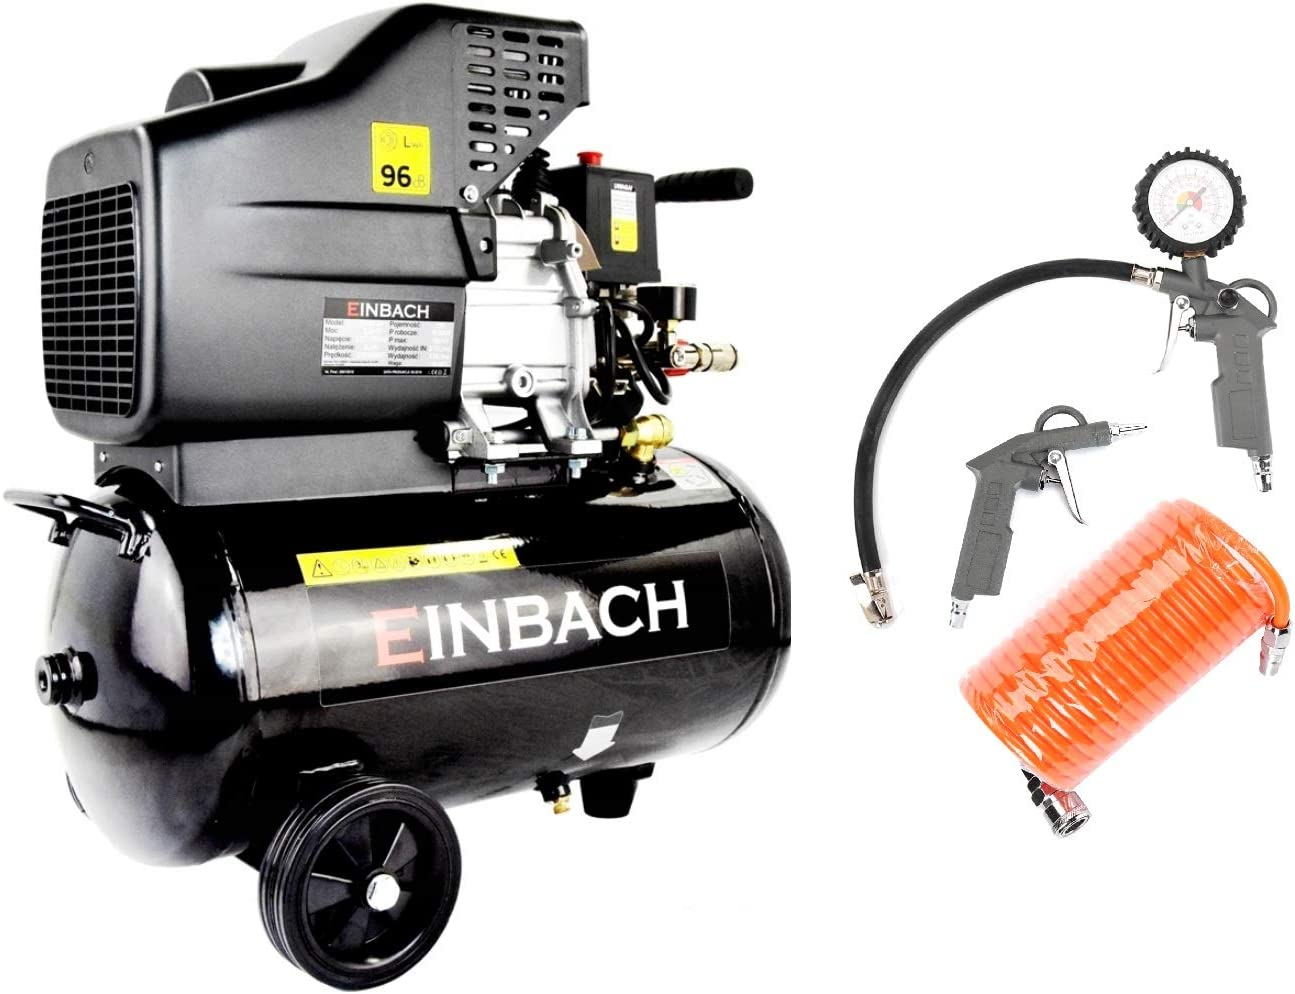 Compresor de aire de EINBACH + 3 piezas de compresor de aire de 24 L Caldera 230 V Pistola de soplado inflador de neumáticos manguera